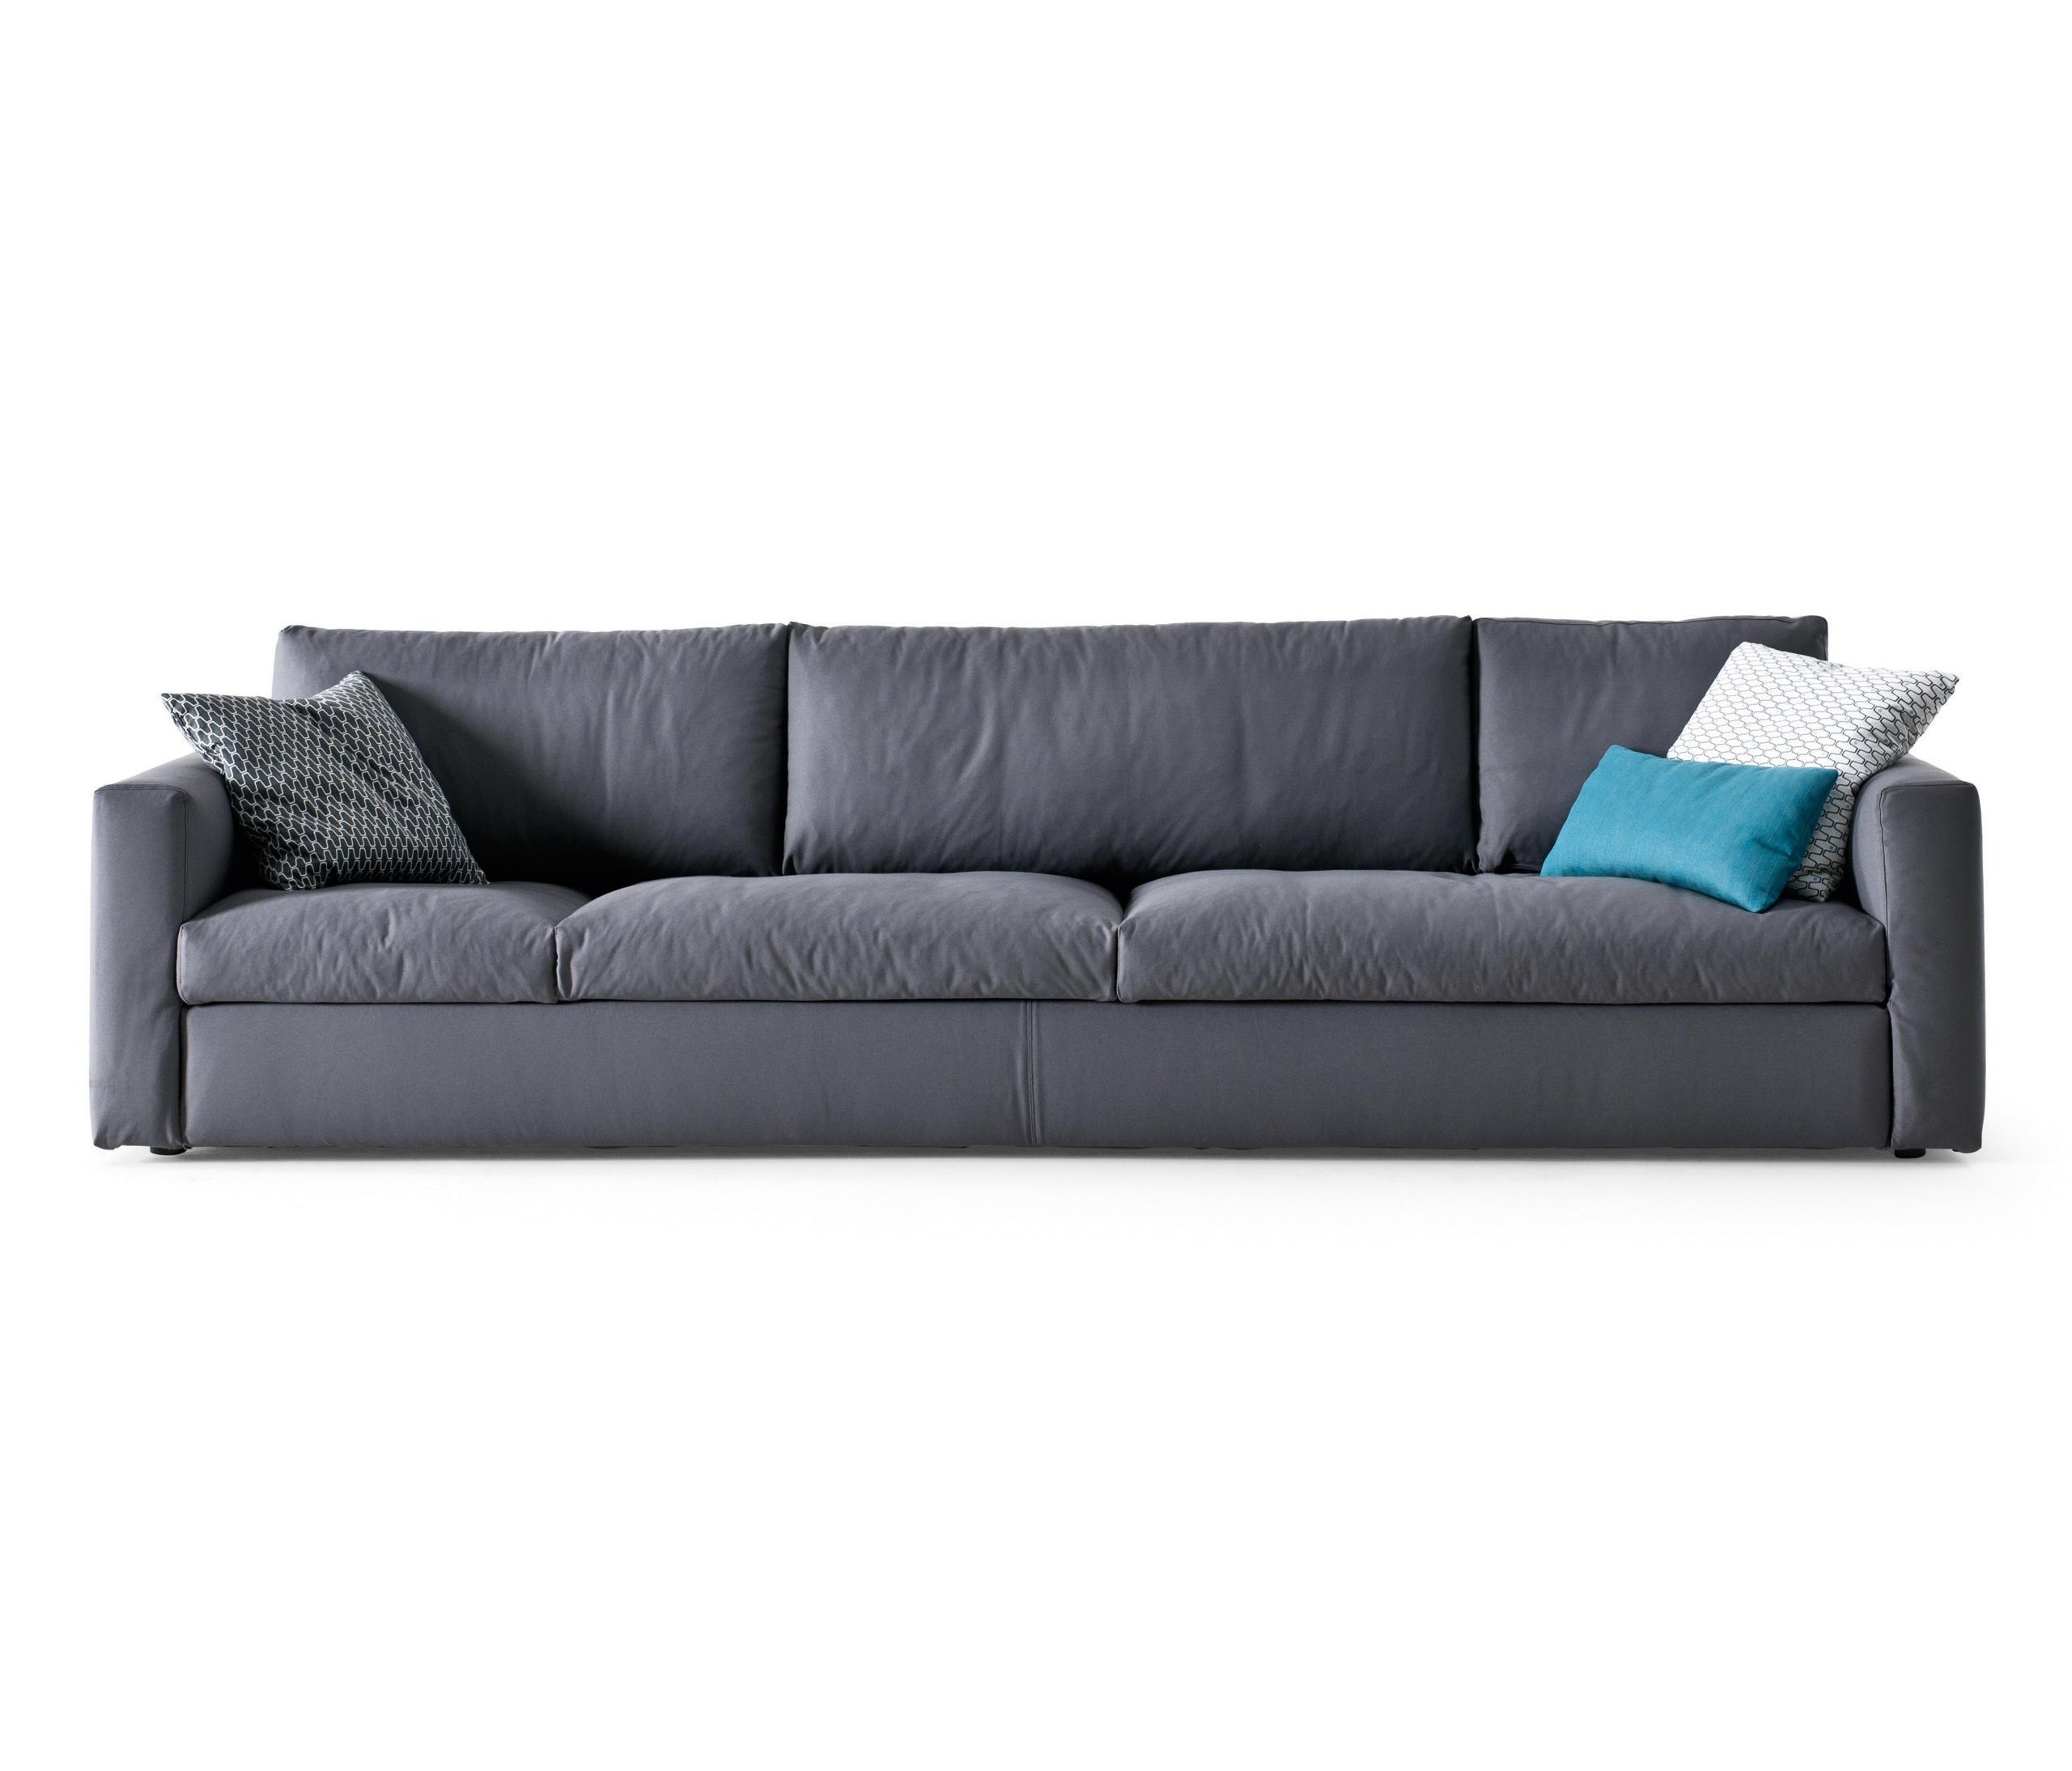 Family Sofa Lounge Sofas From Saba Italia Architonic Throughout Family Sofa (Image 6 of 15)